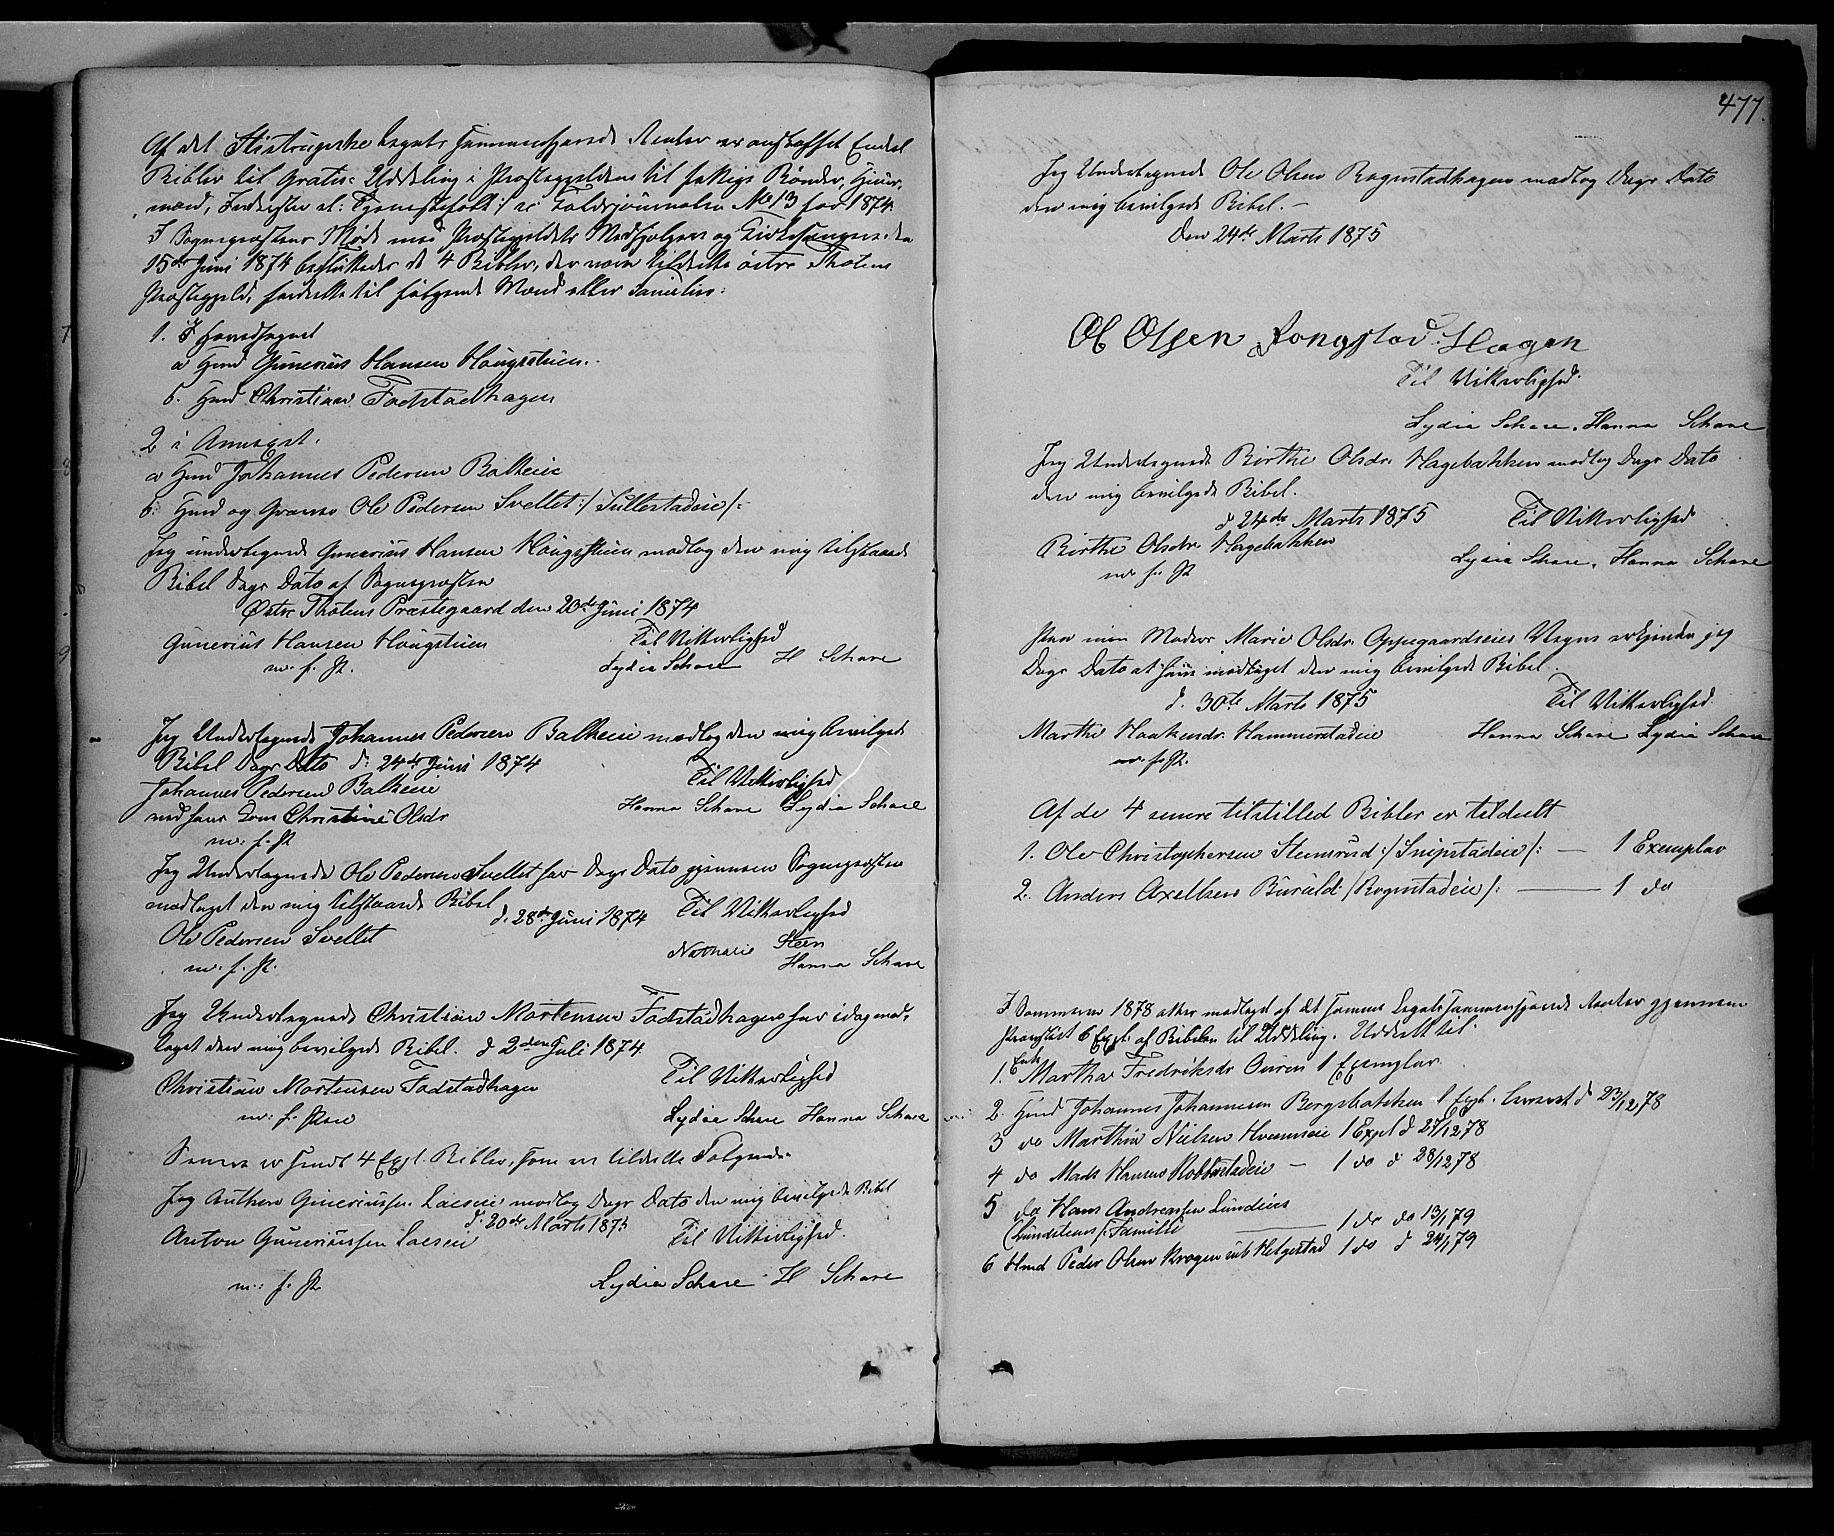 SAH, Østre Toten prestekontor, Ministerialbok nr. 5, 1866-1877, s. 477